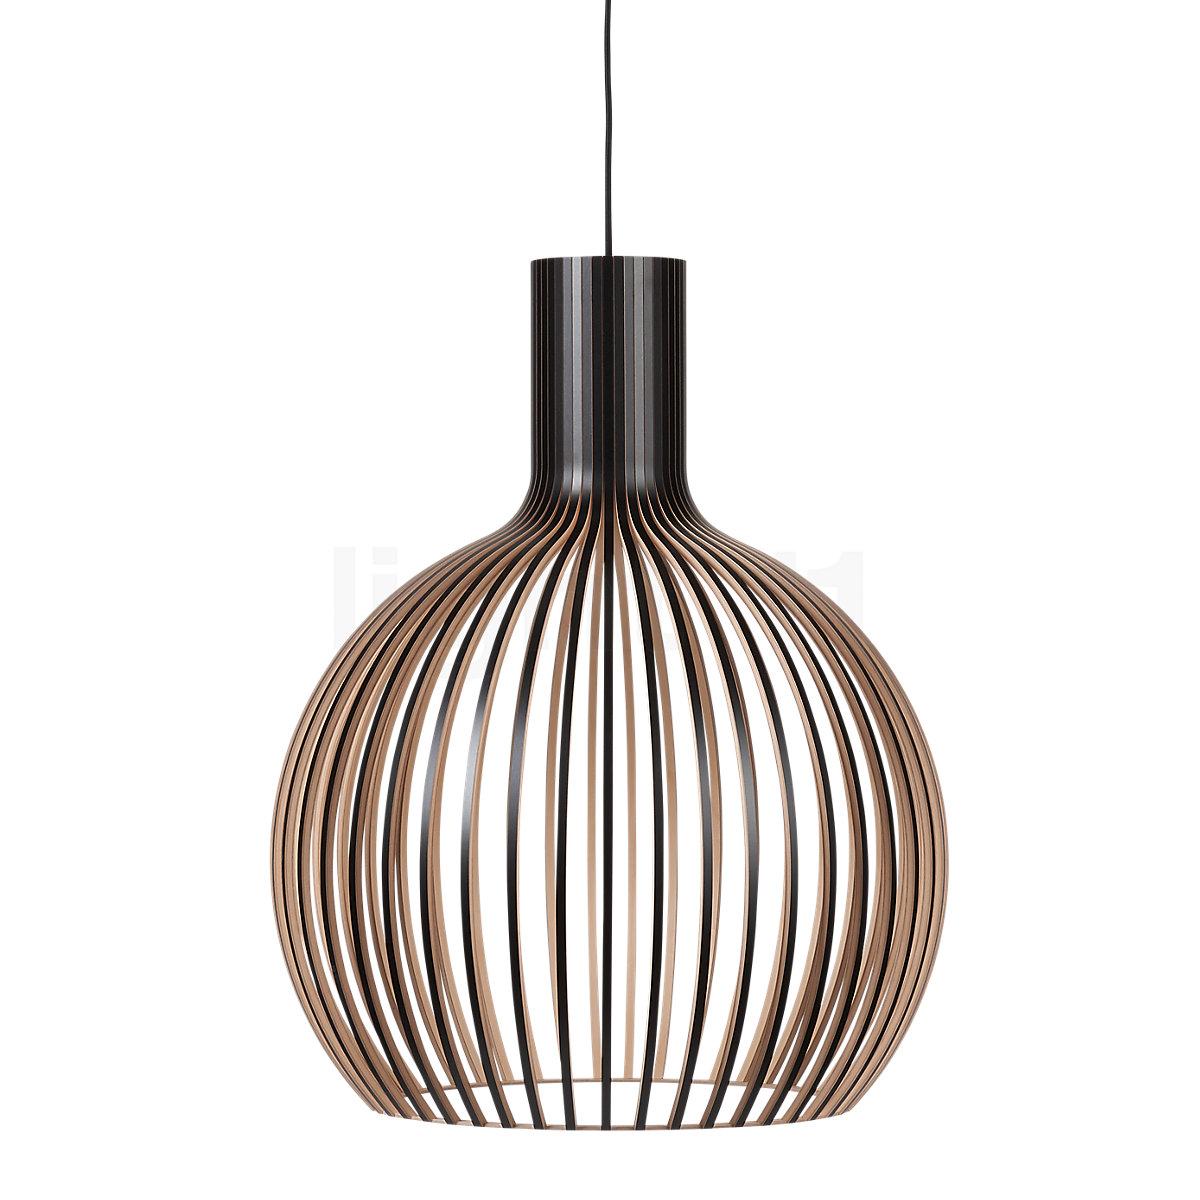 Buy Secto Design Octo 4240 Pendant Light At Light11 Eu